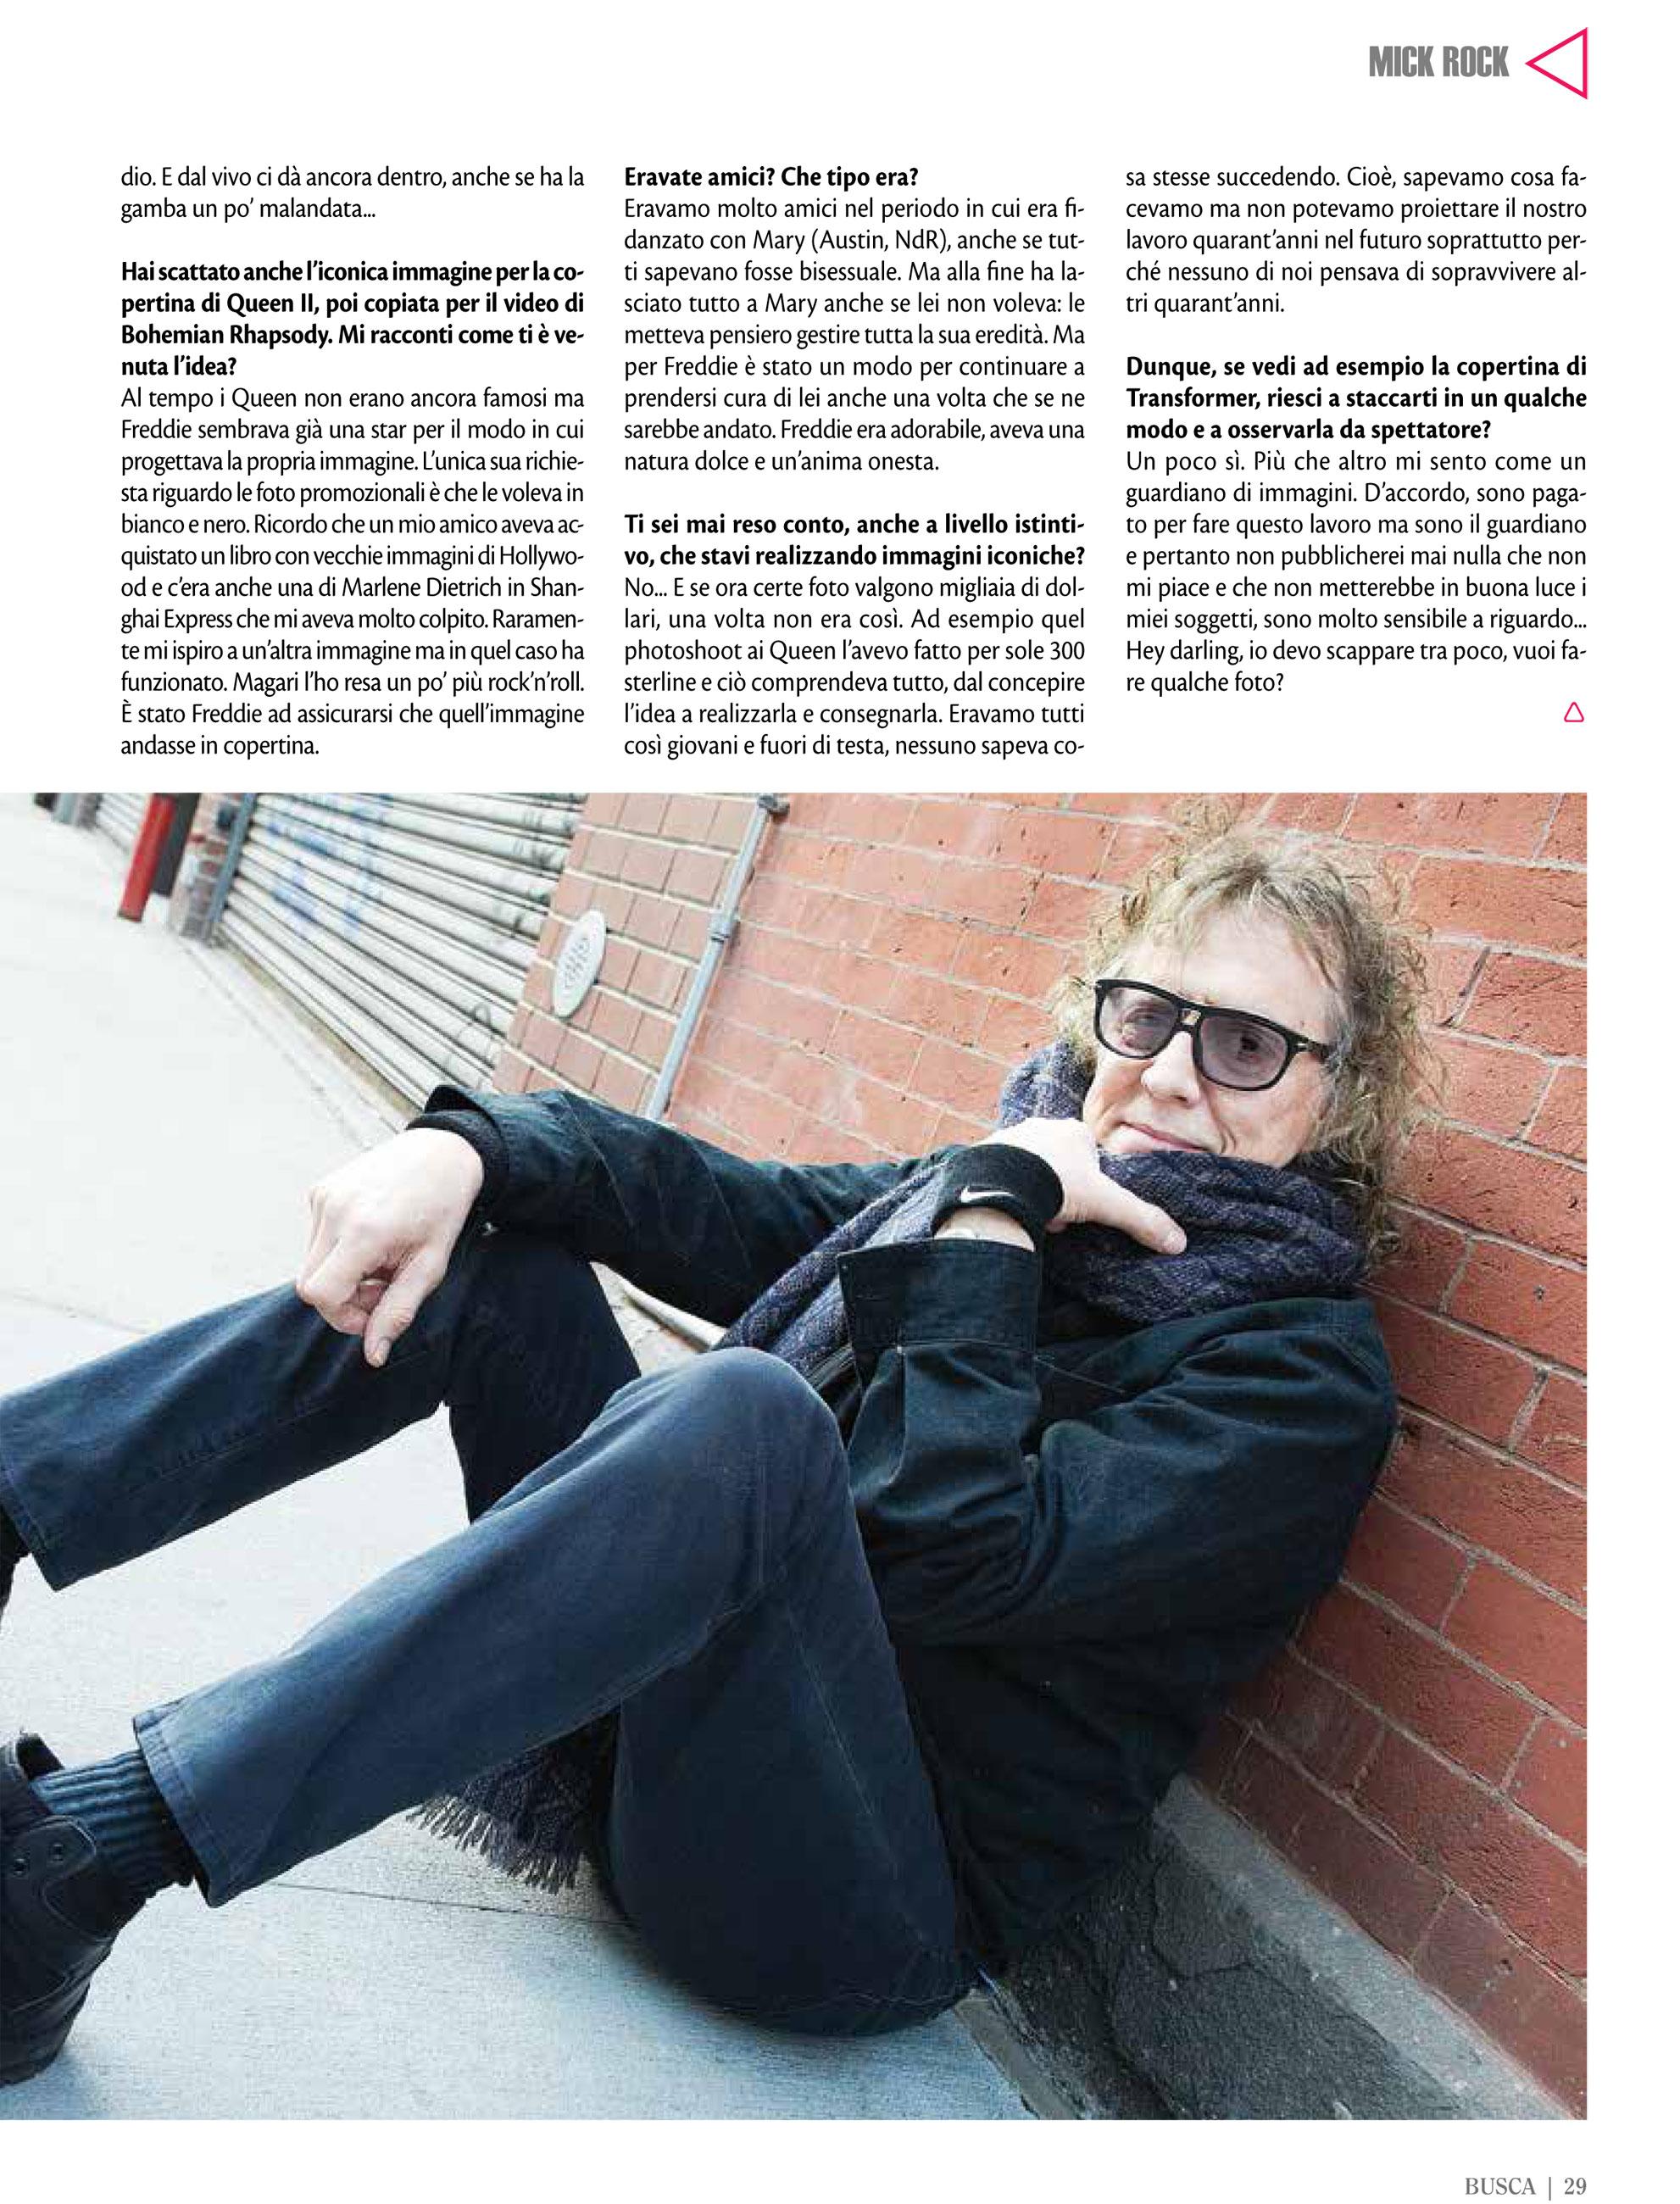 Buscadero: Mick Rock interview & photo